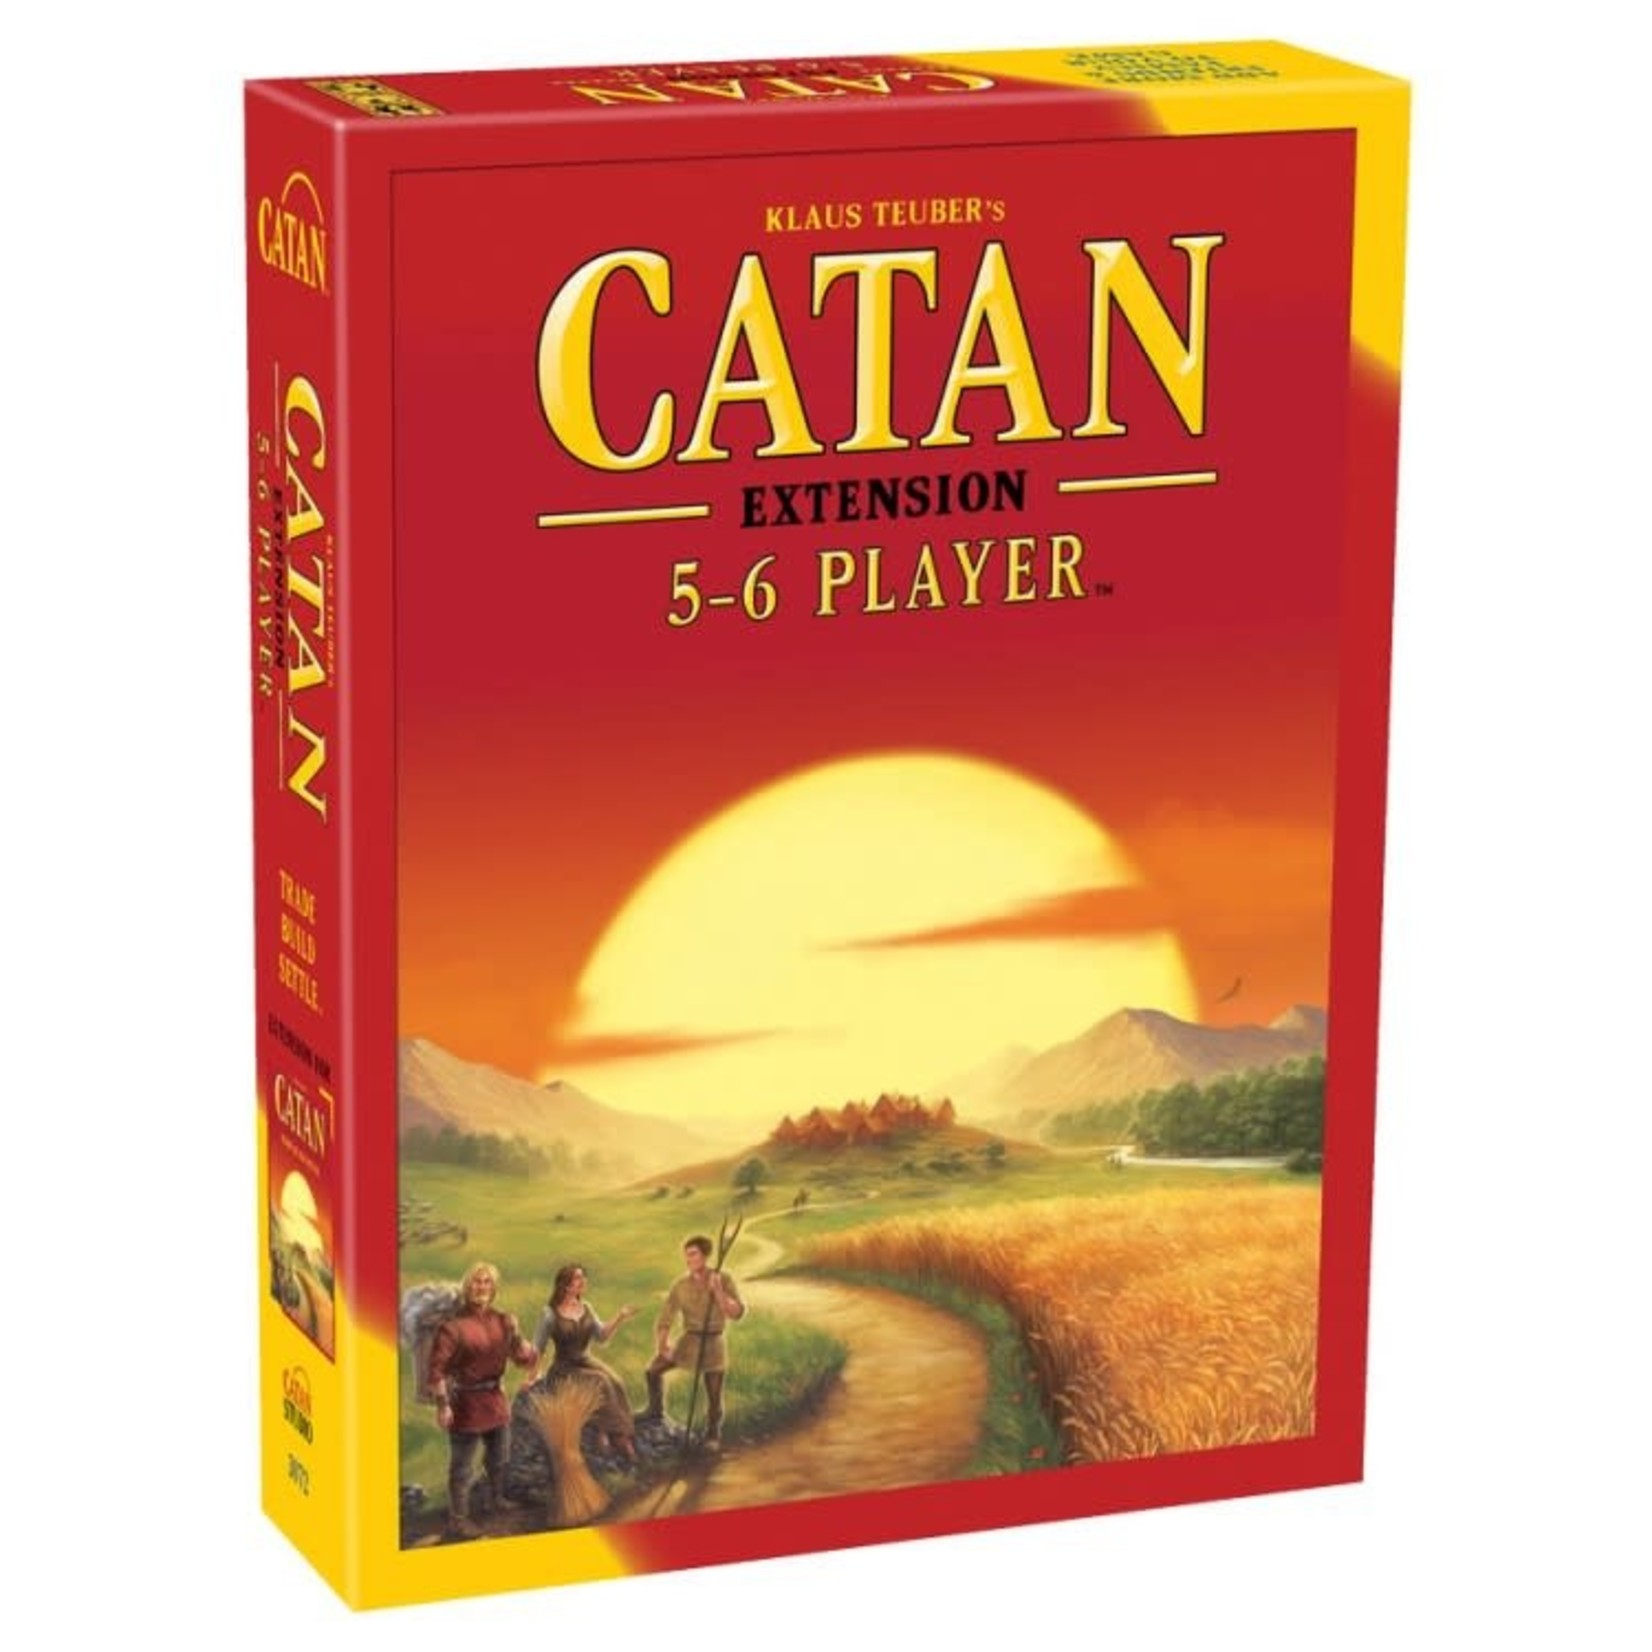 Catan Studios Inc. Catan 5-6 Player Extension